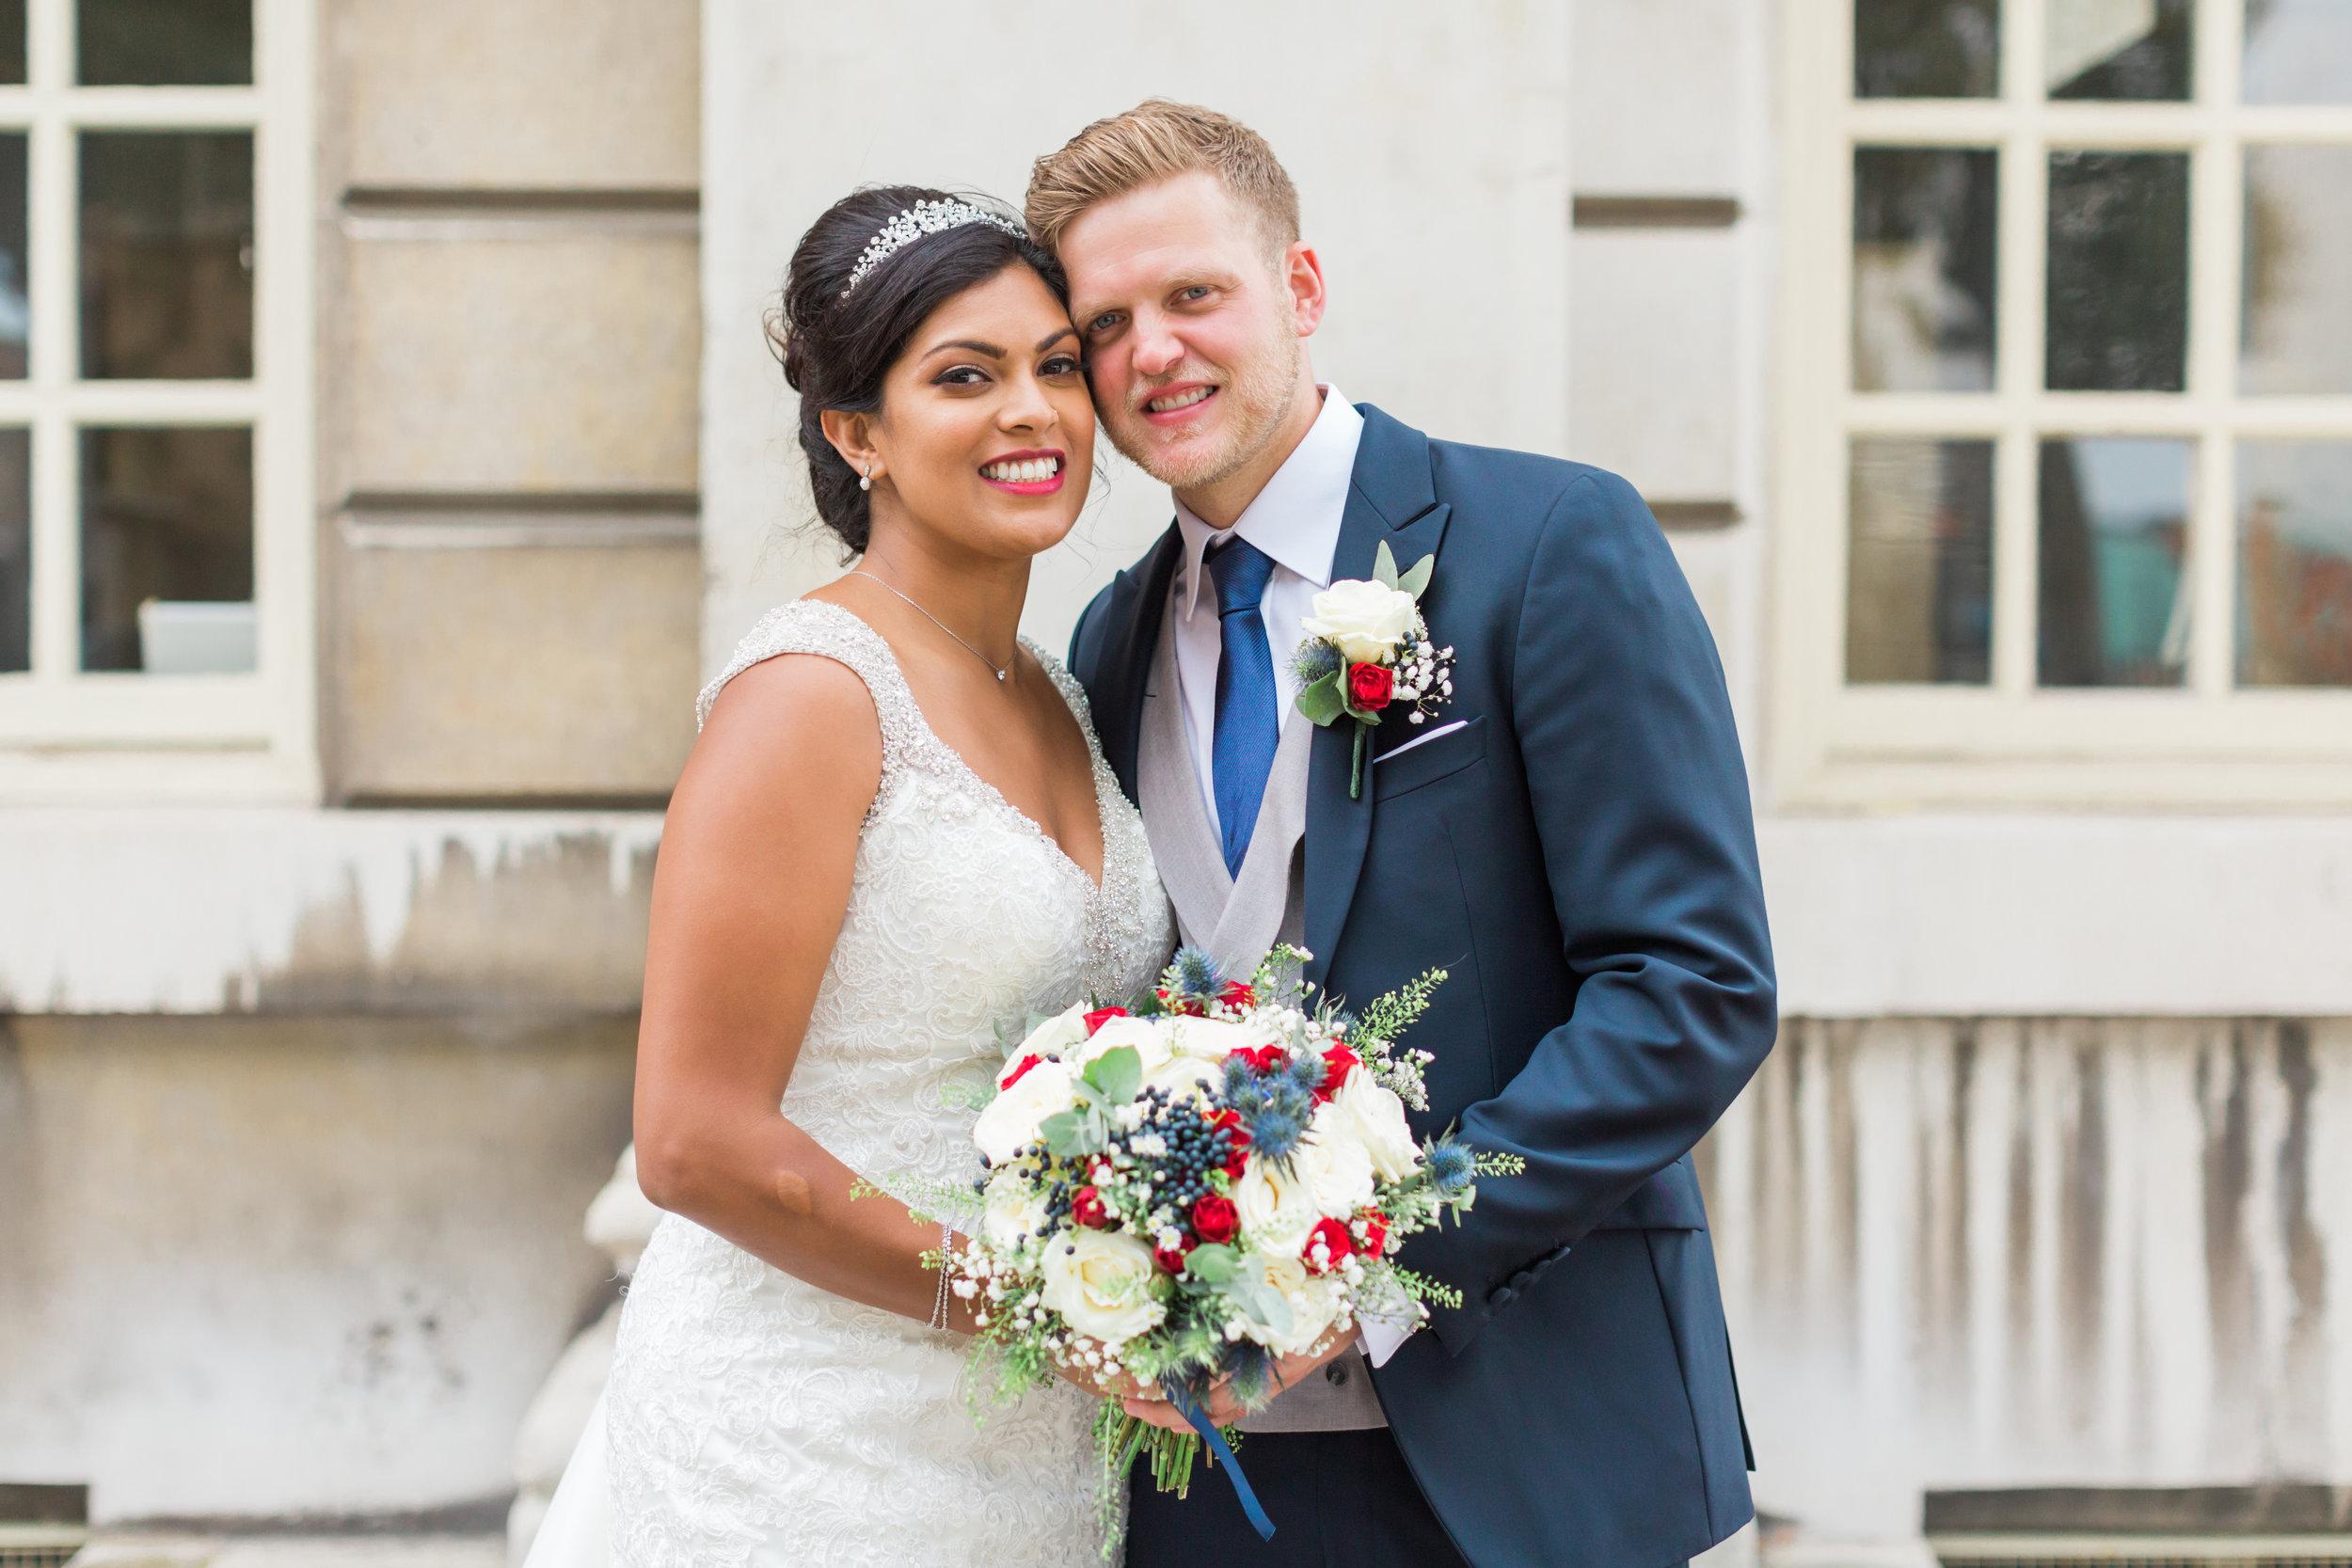 happy-wedding-photography.jpg